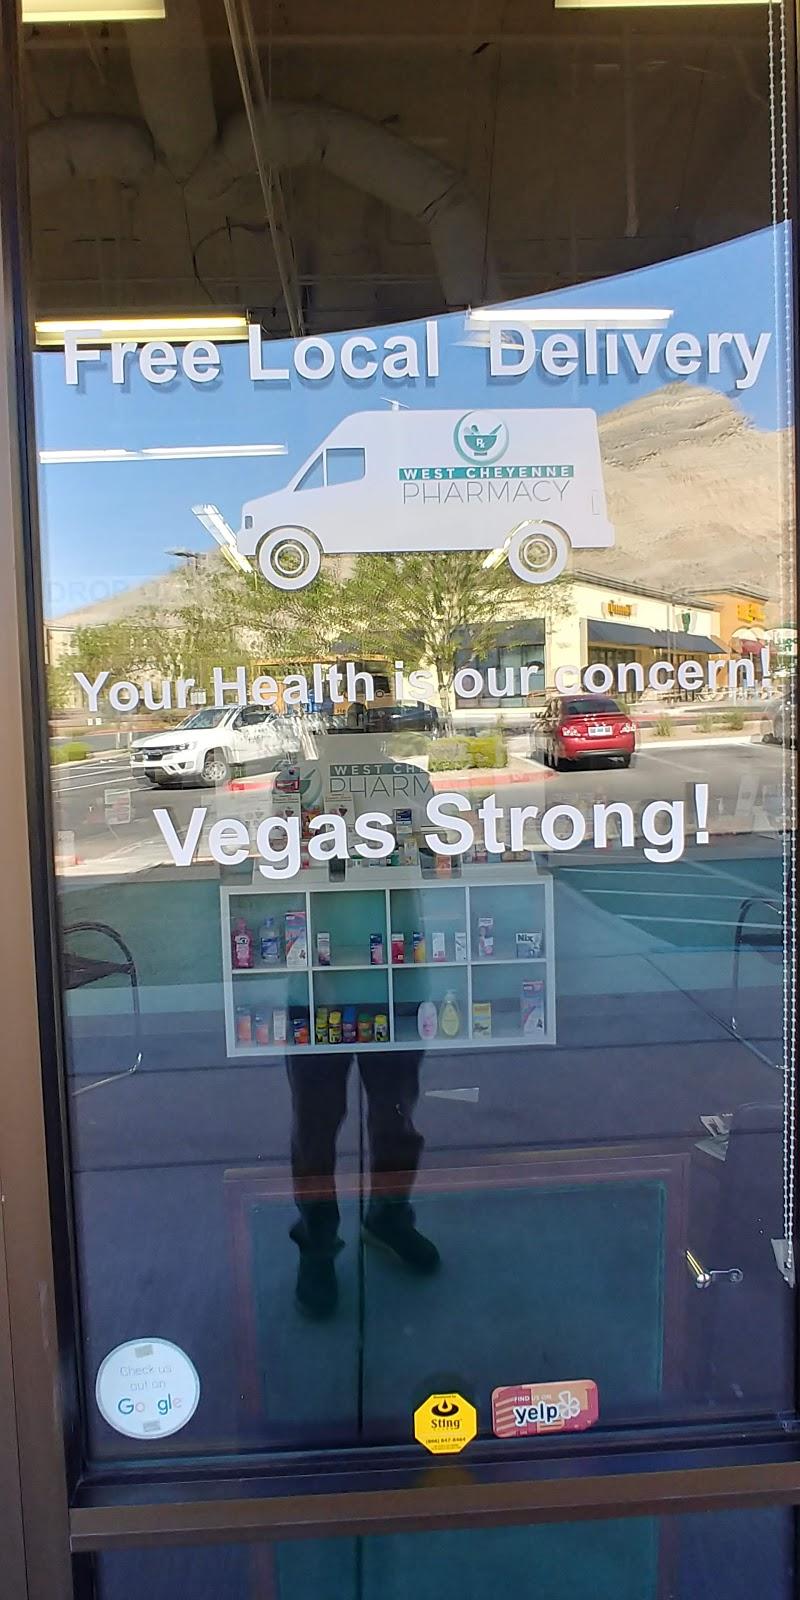 West Cheyenne Pharmacy - pharmacy    Photo 6 of 8   Address: 3350 Novat St suite 110, Las Vegas, NV 89129, USA   Phone: (702) 395-3004